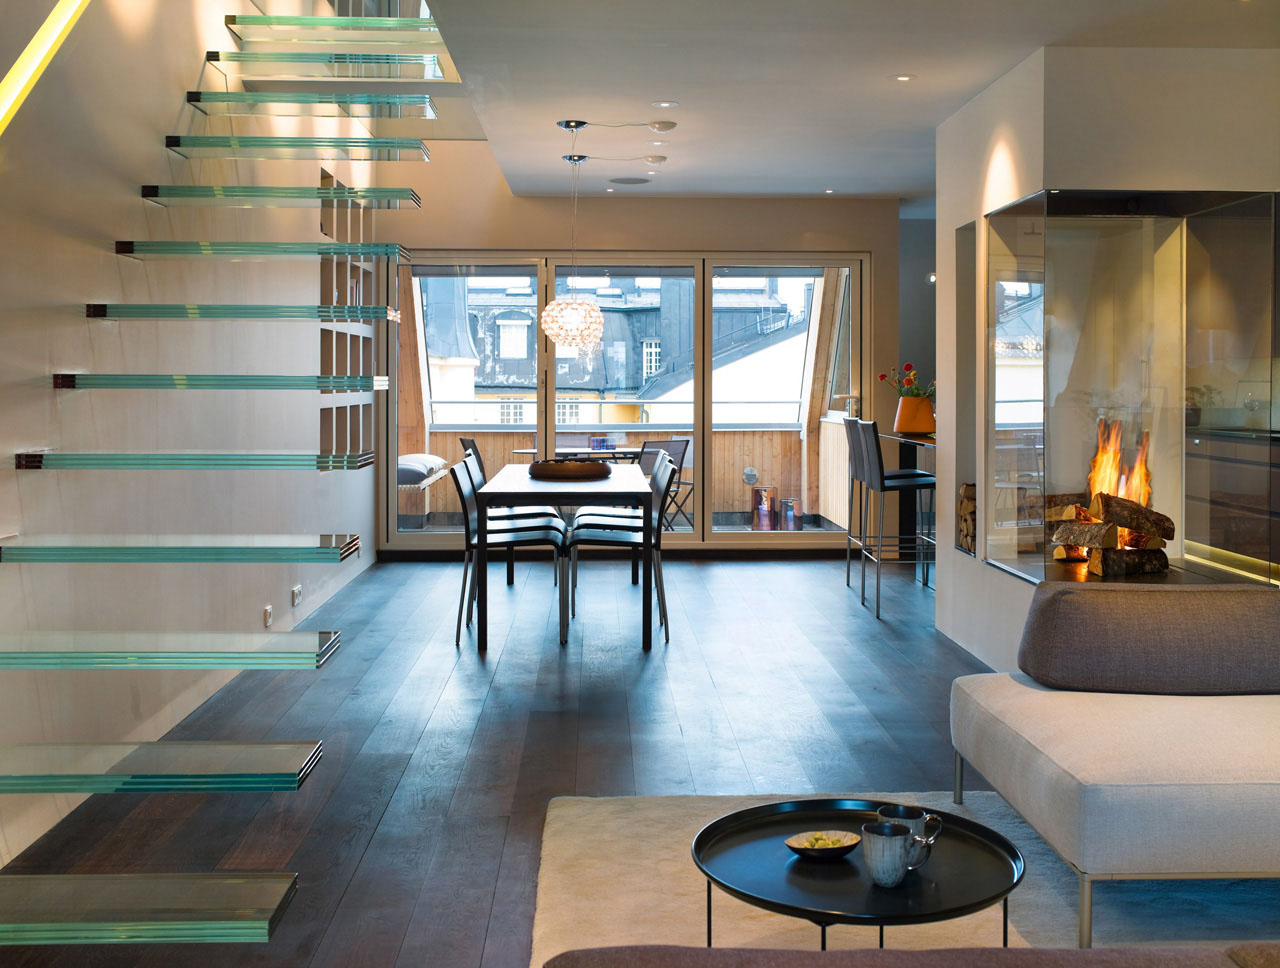 Modern Penthouse : Elegant Modern Penthouse With Glass Theme  iDesignArch  Interior ...